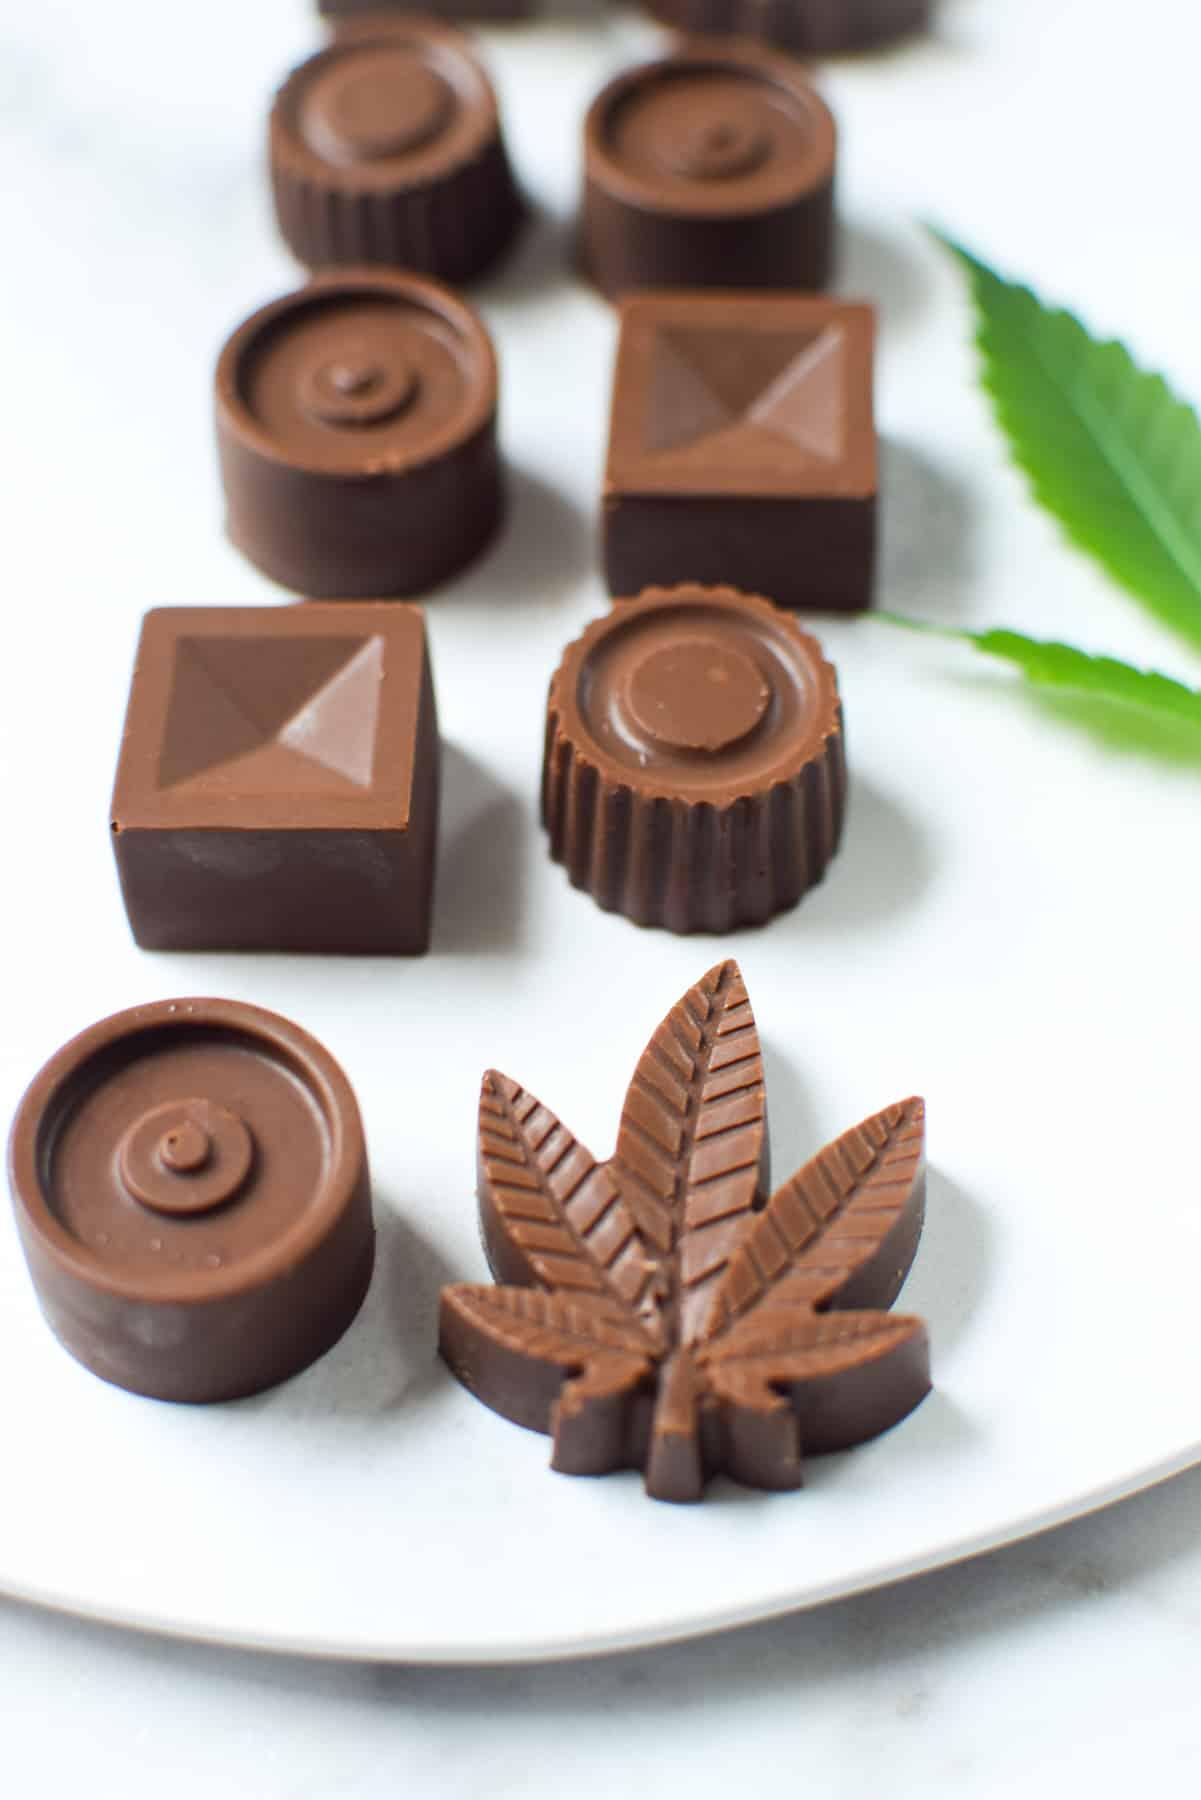 Finished image of molded cannabis infused chocolates